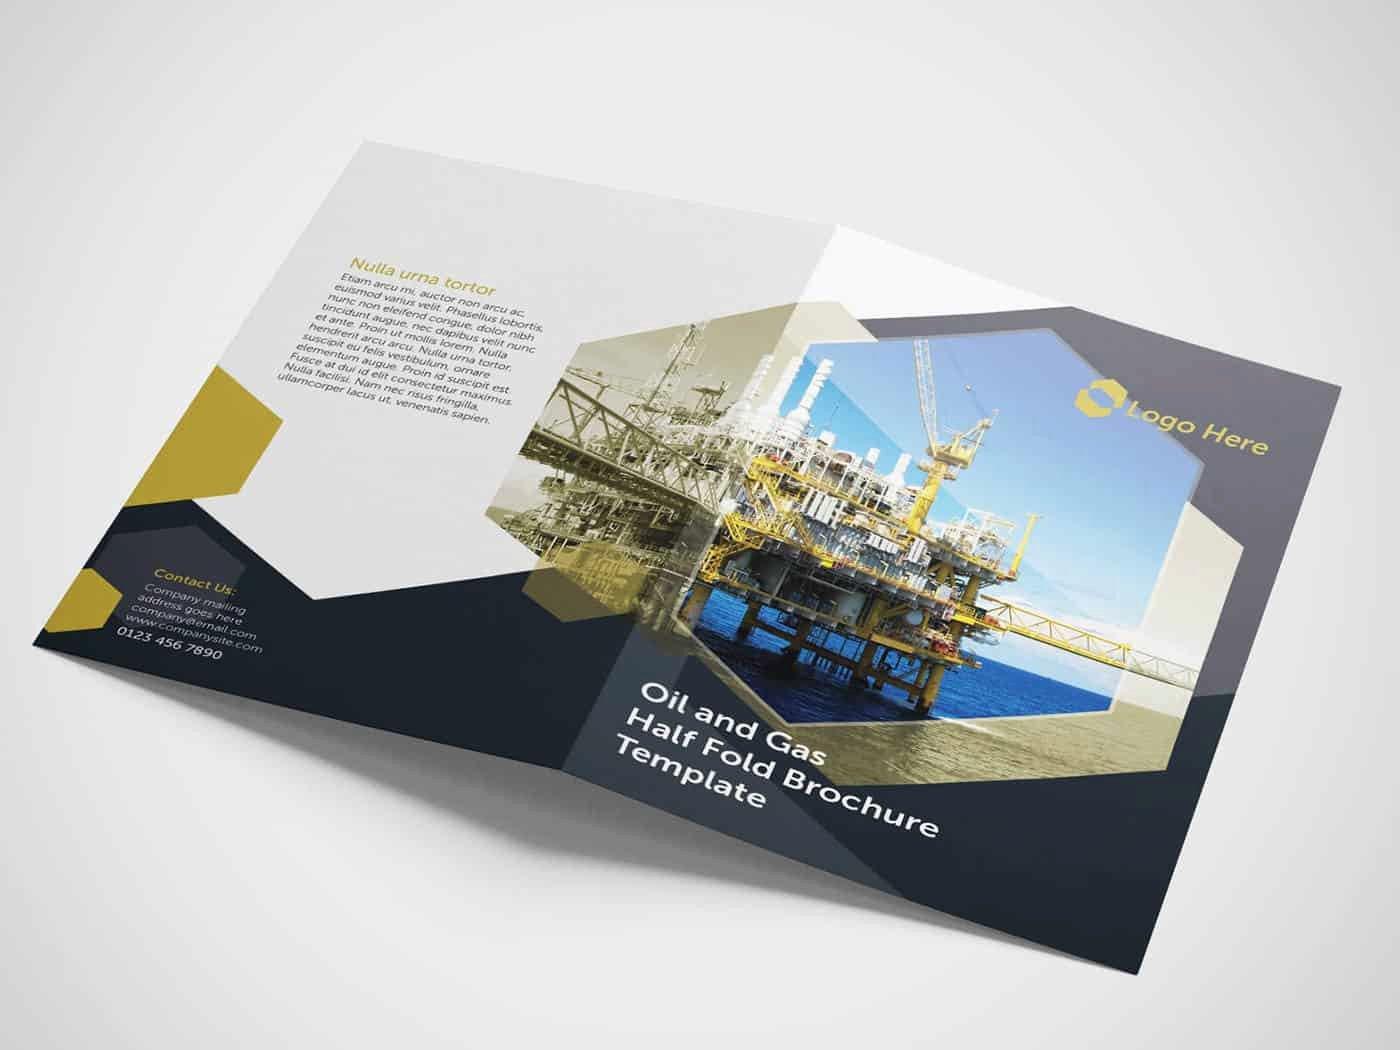 Half Fold Brochure Template New Half Fold Oil and Gas Brochure Template On Vectogravic Design